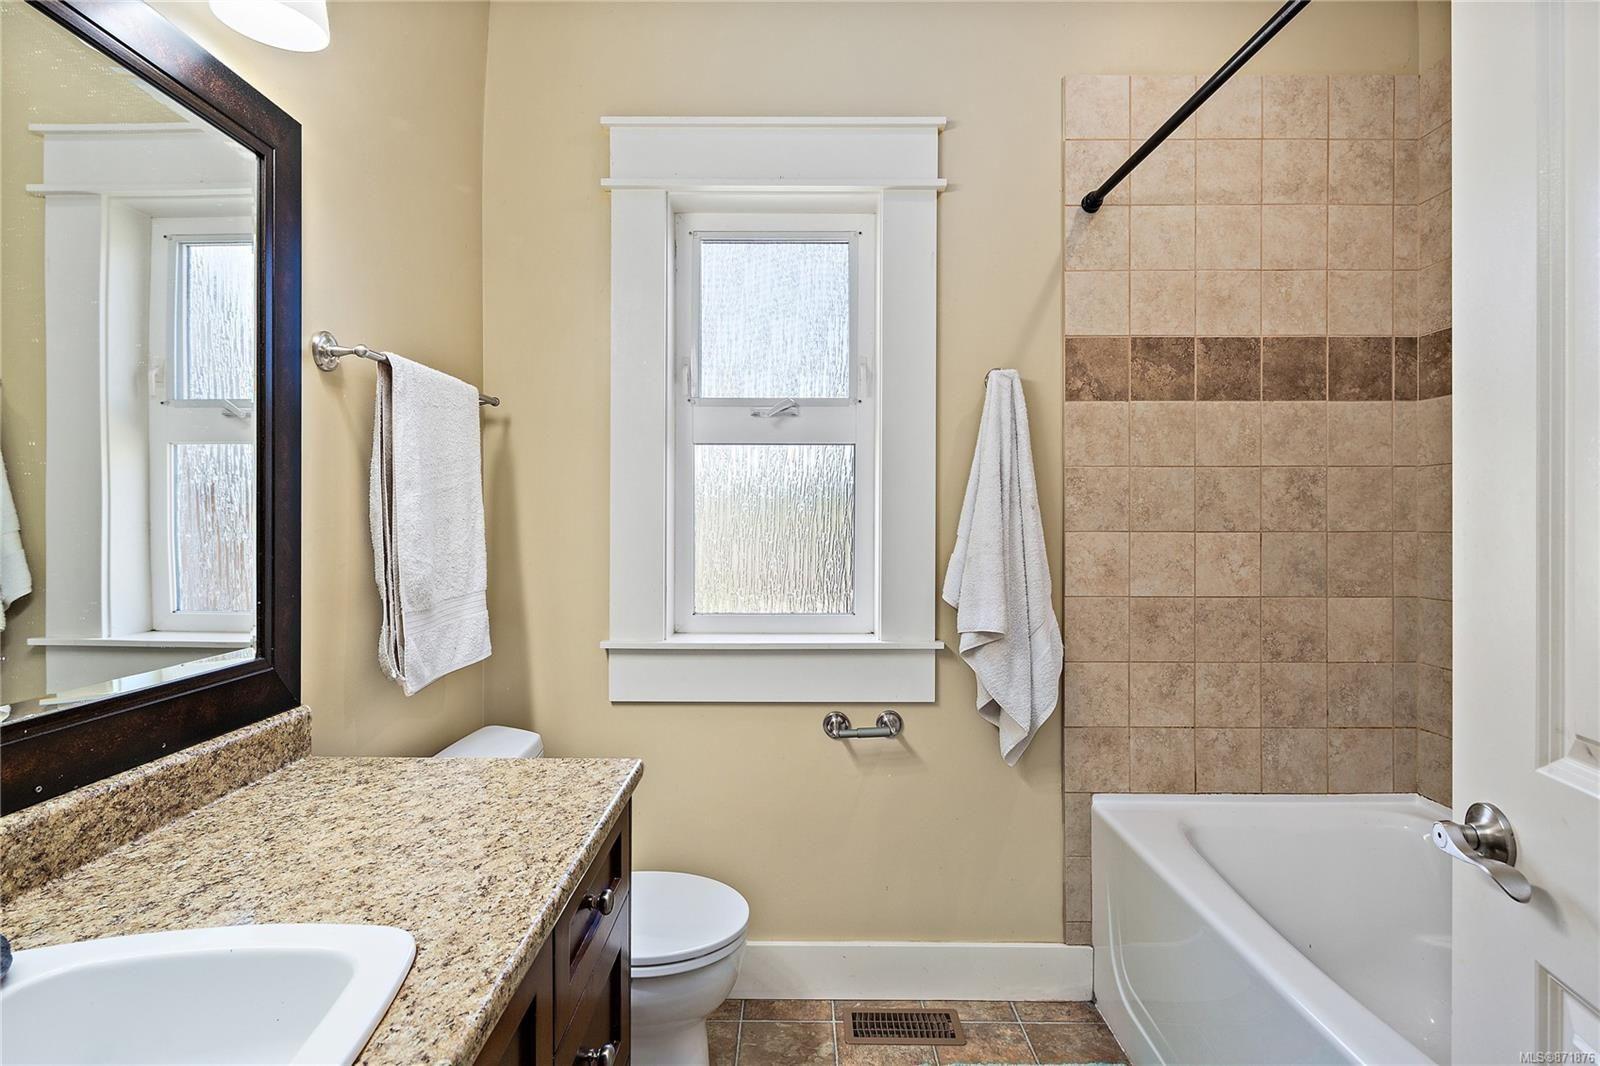 Photo 30: Photos: 4420 Wilkinson Rd in : SW Royal Oak House for sale (Saanich West)  : MLS®# 871876